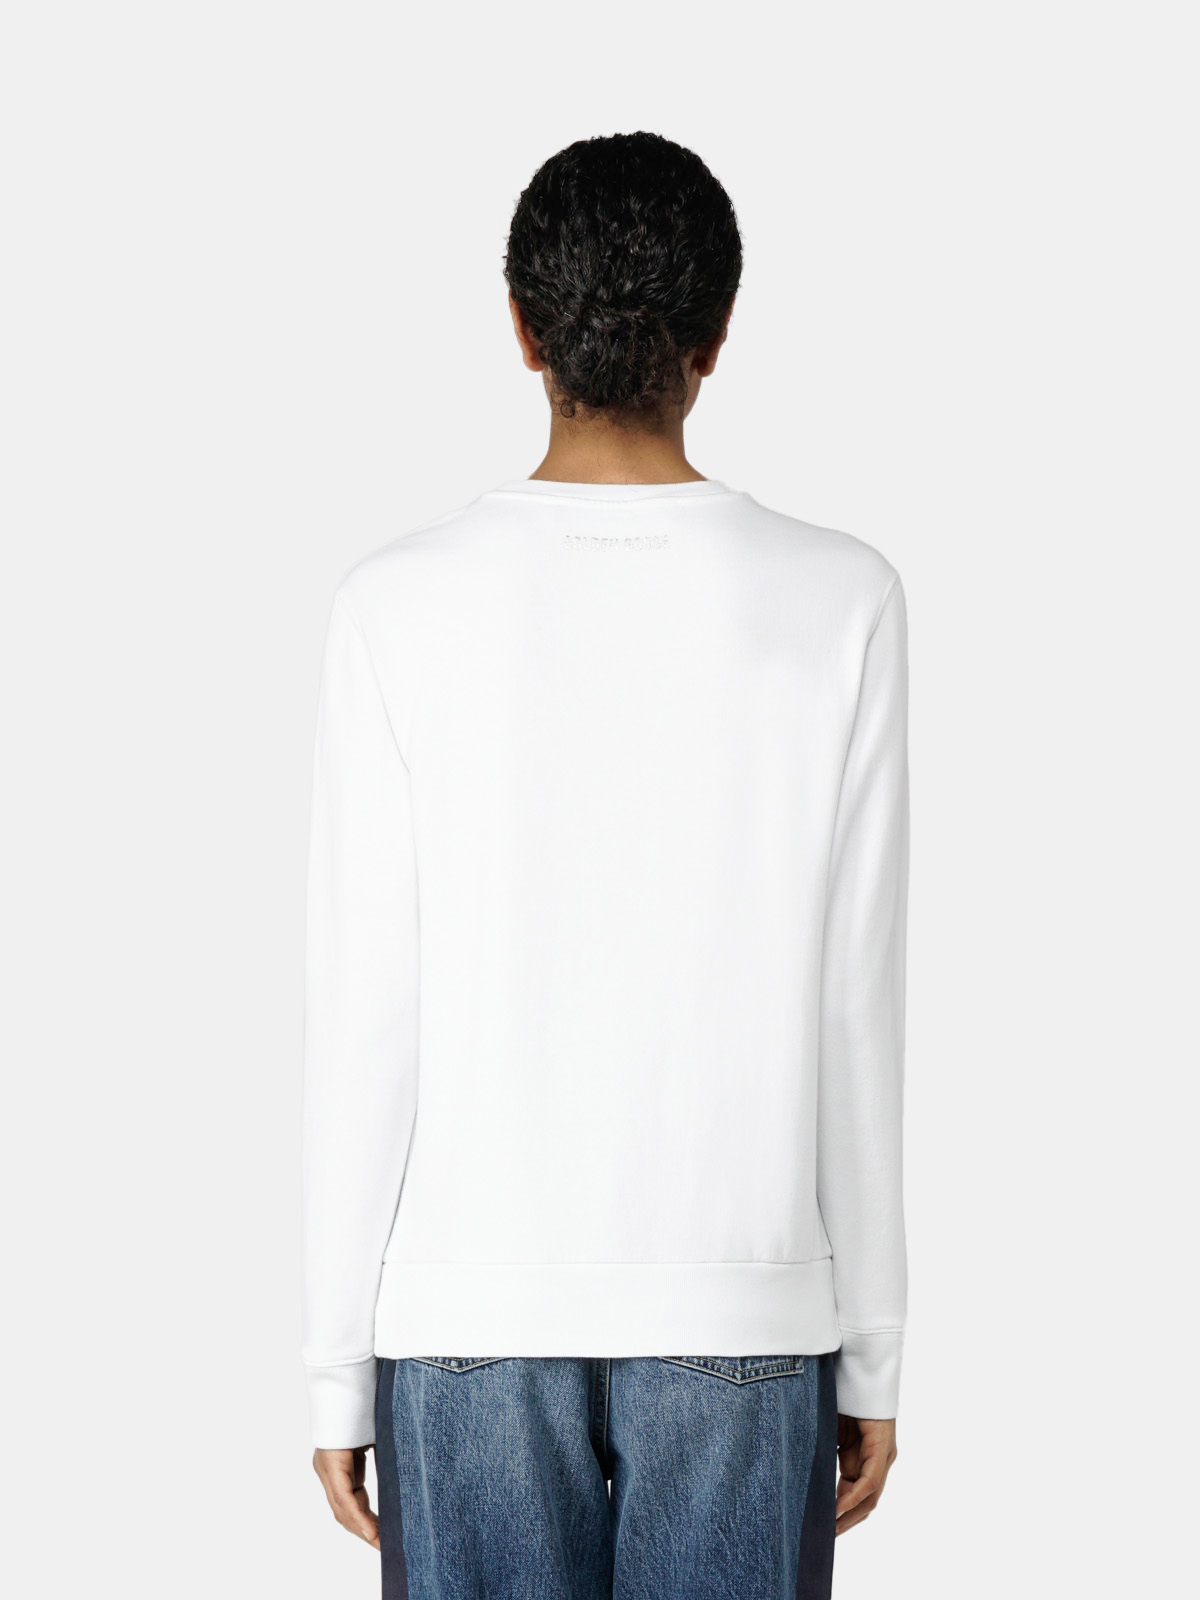 Golden Goose - Athena white sweatshirt with laminated star print in